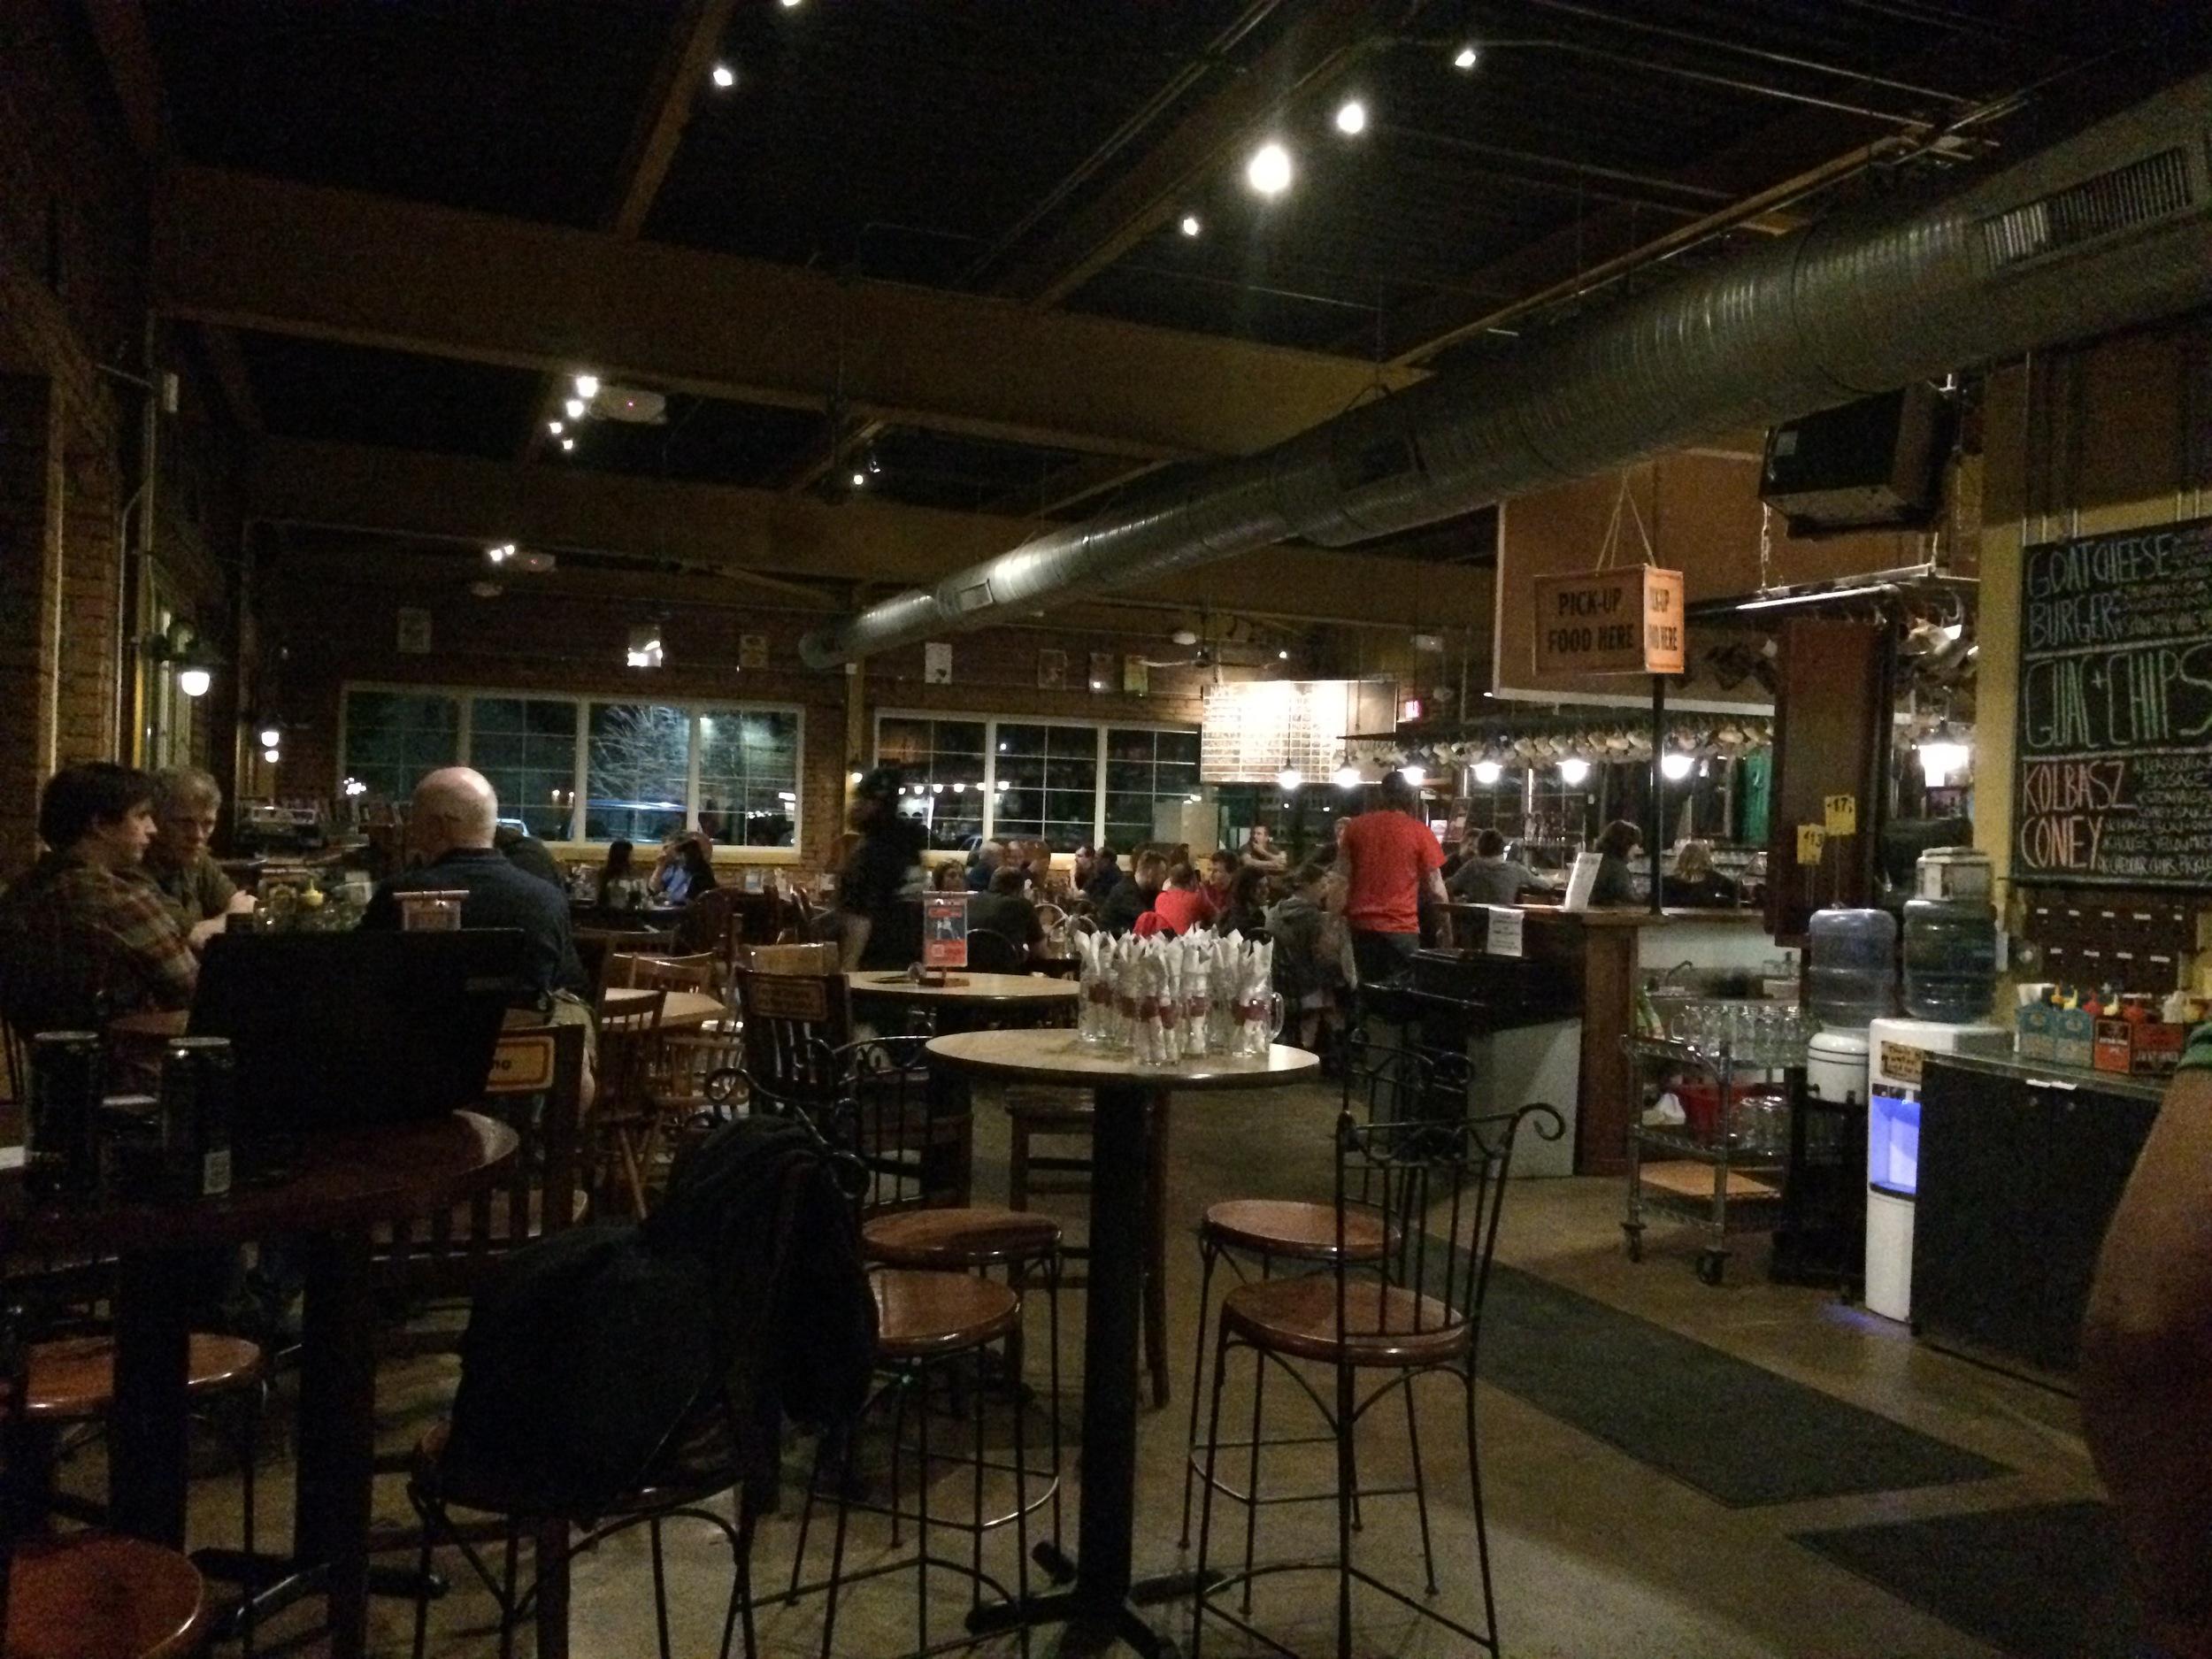 Enjoying the laid back vibe of Corner Brewery